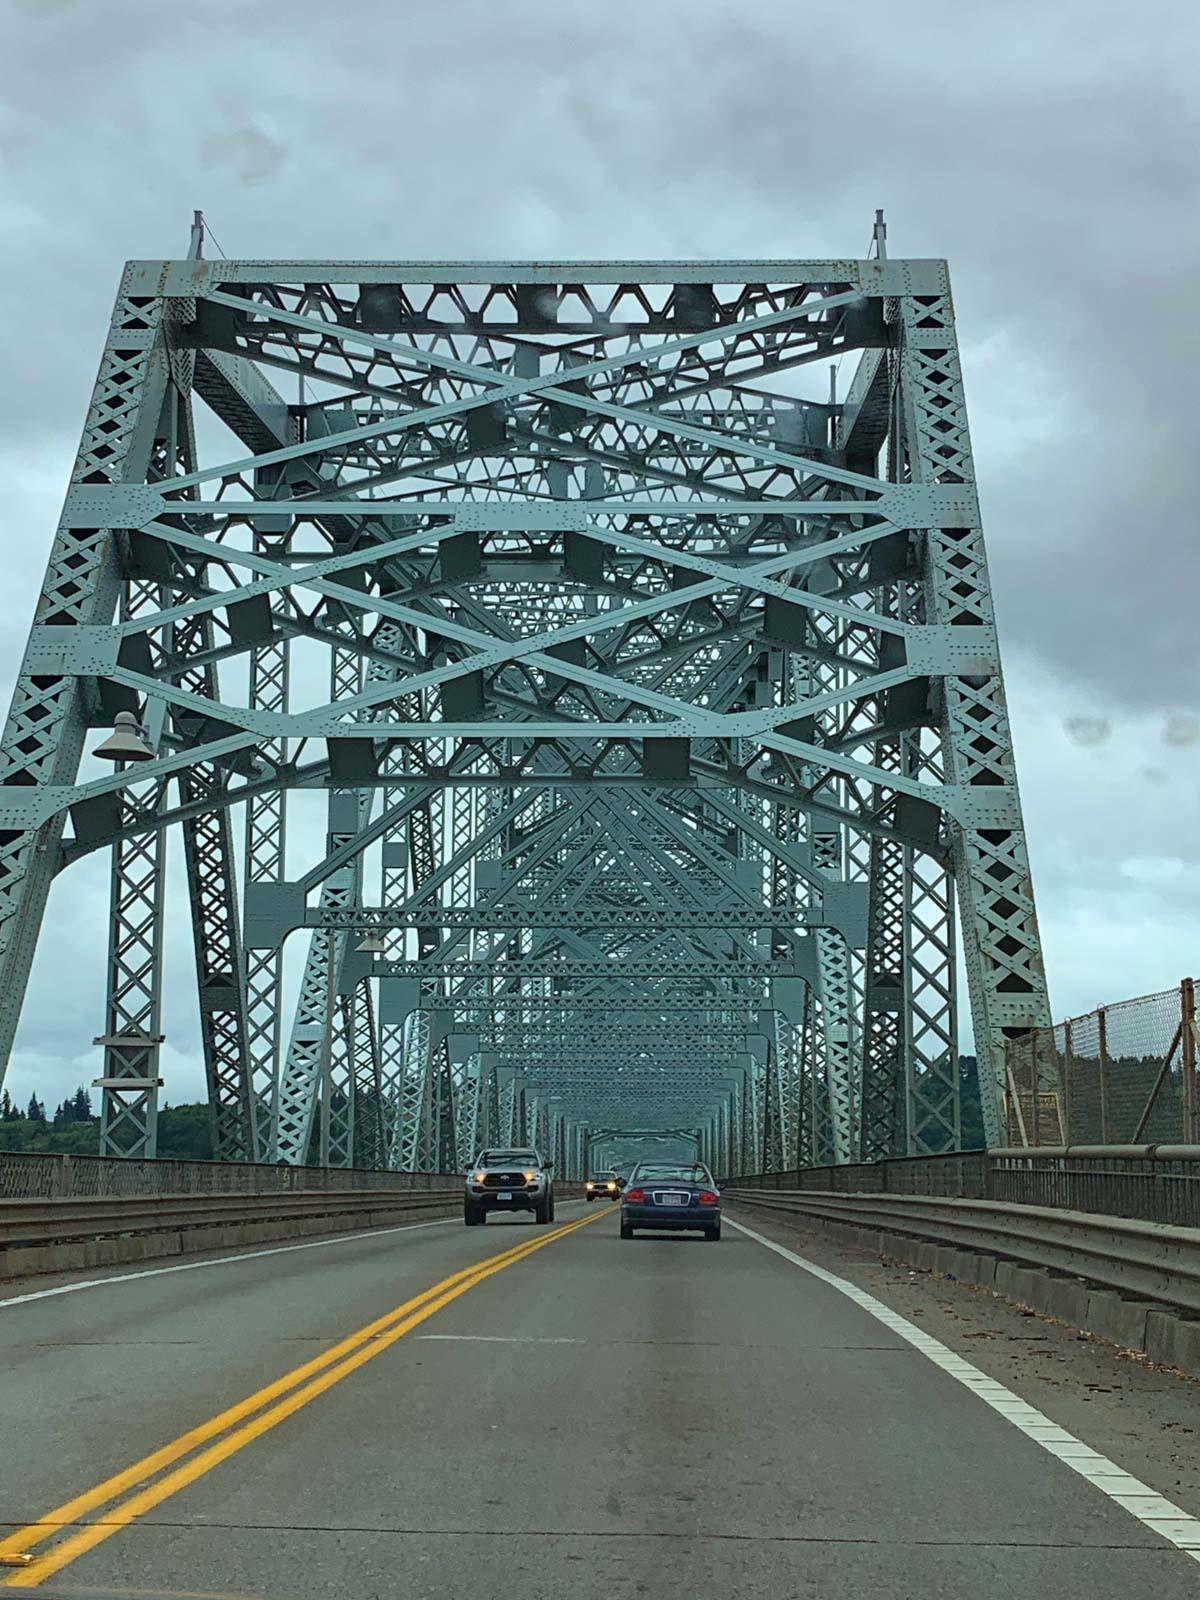 lots of bridges